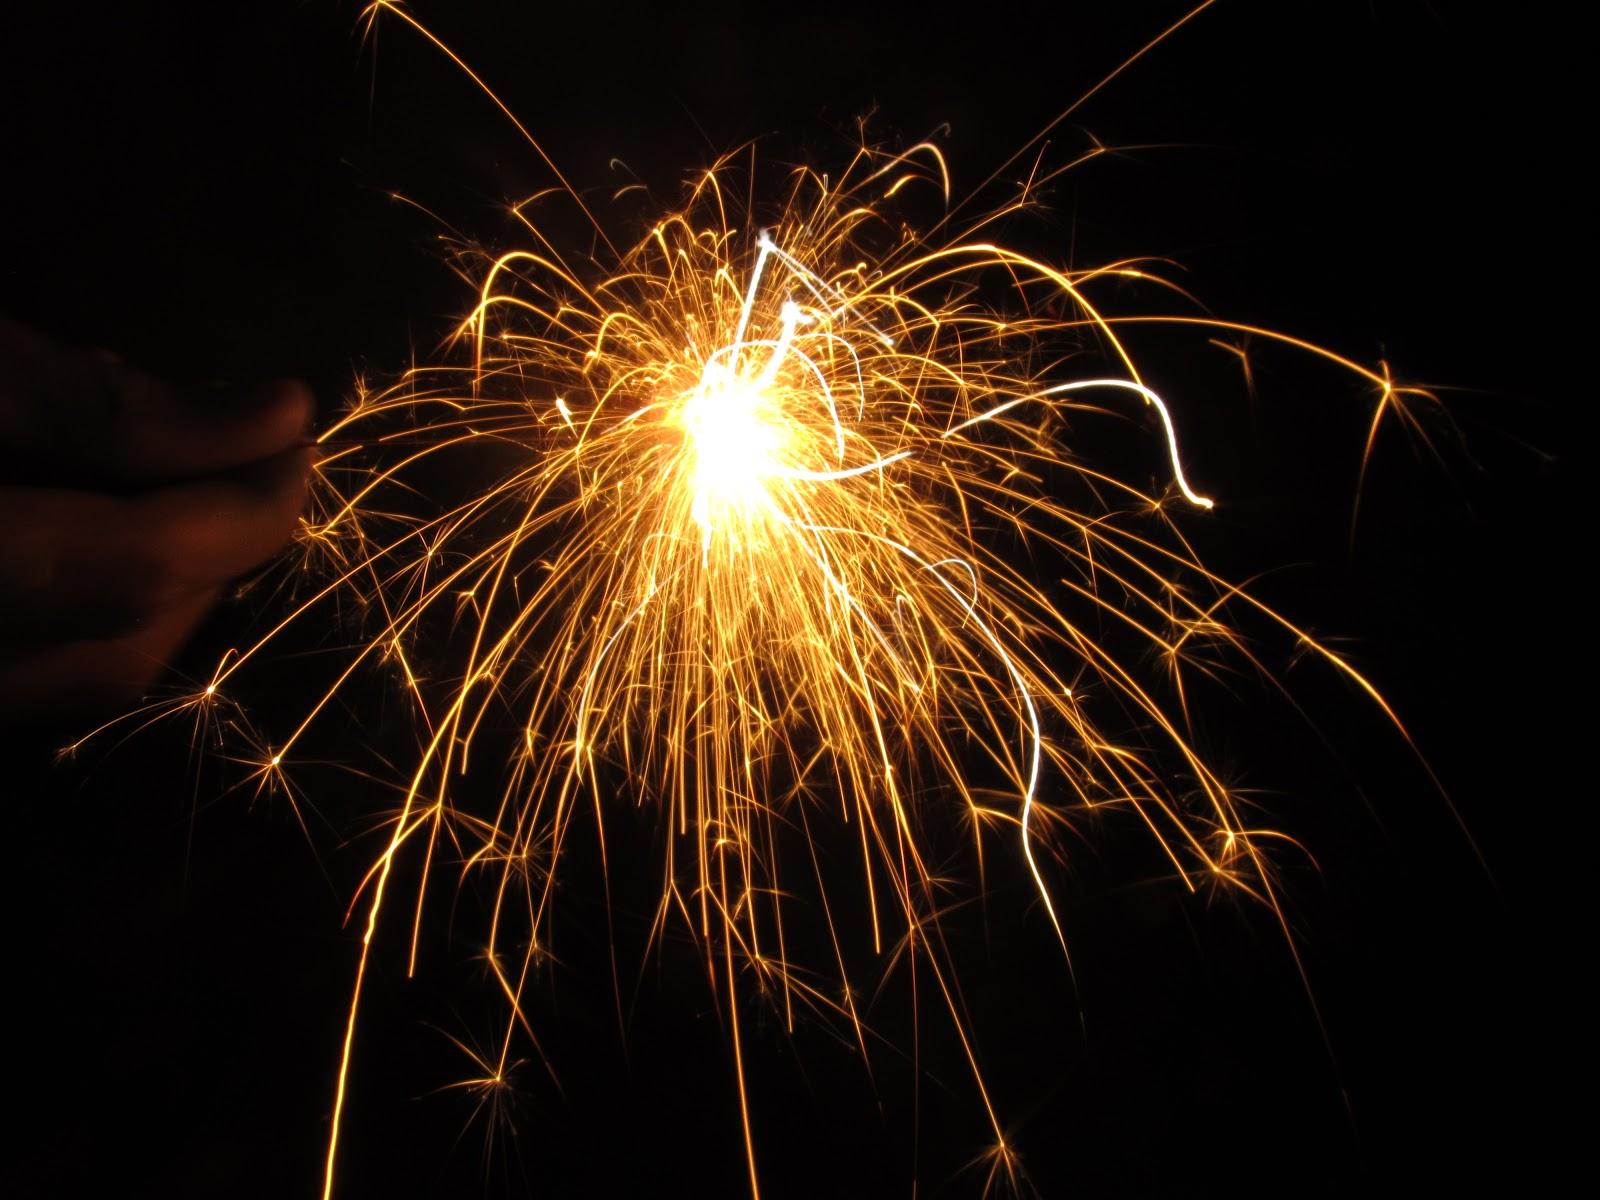 Diwali Fire Crackers